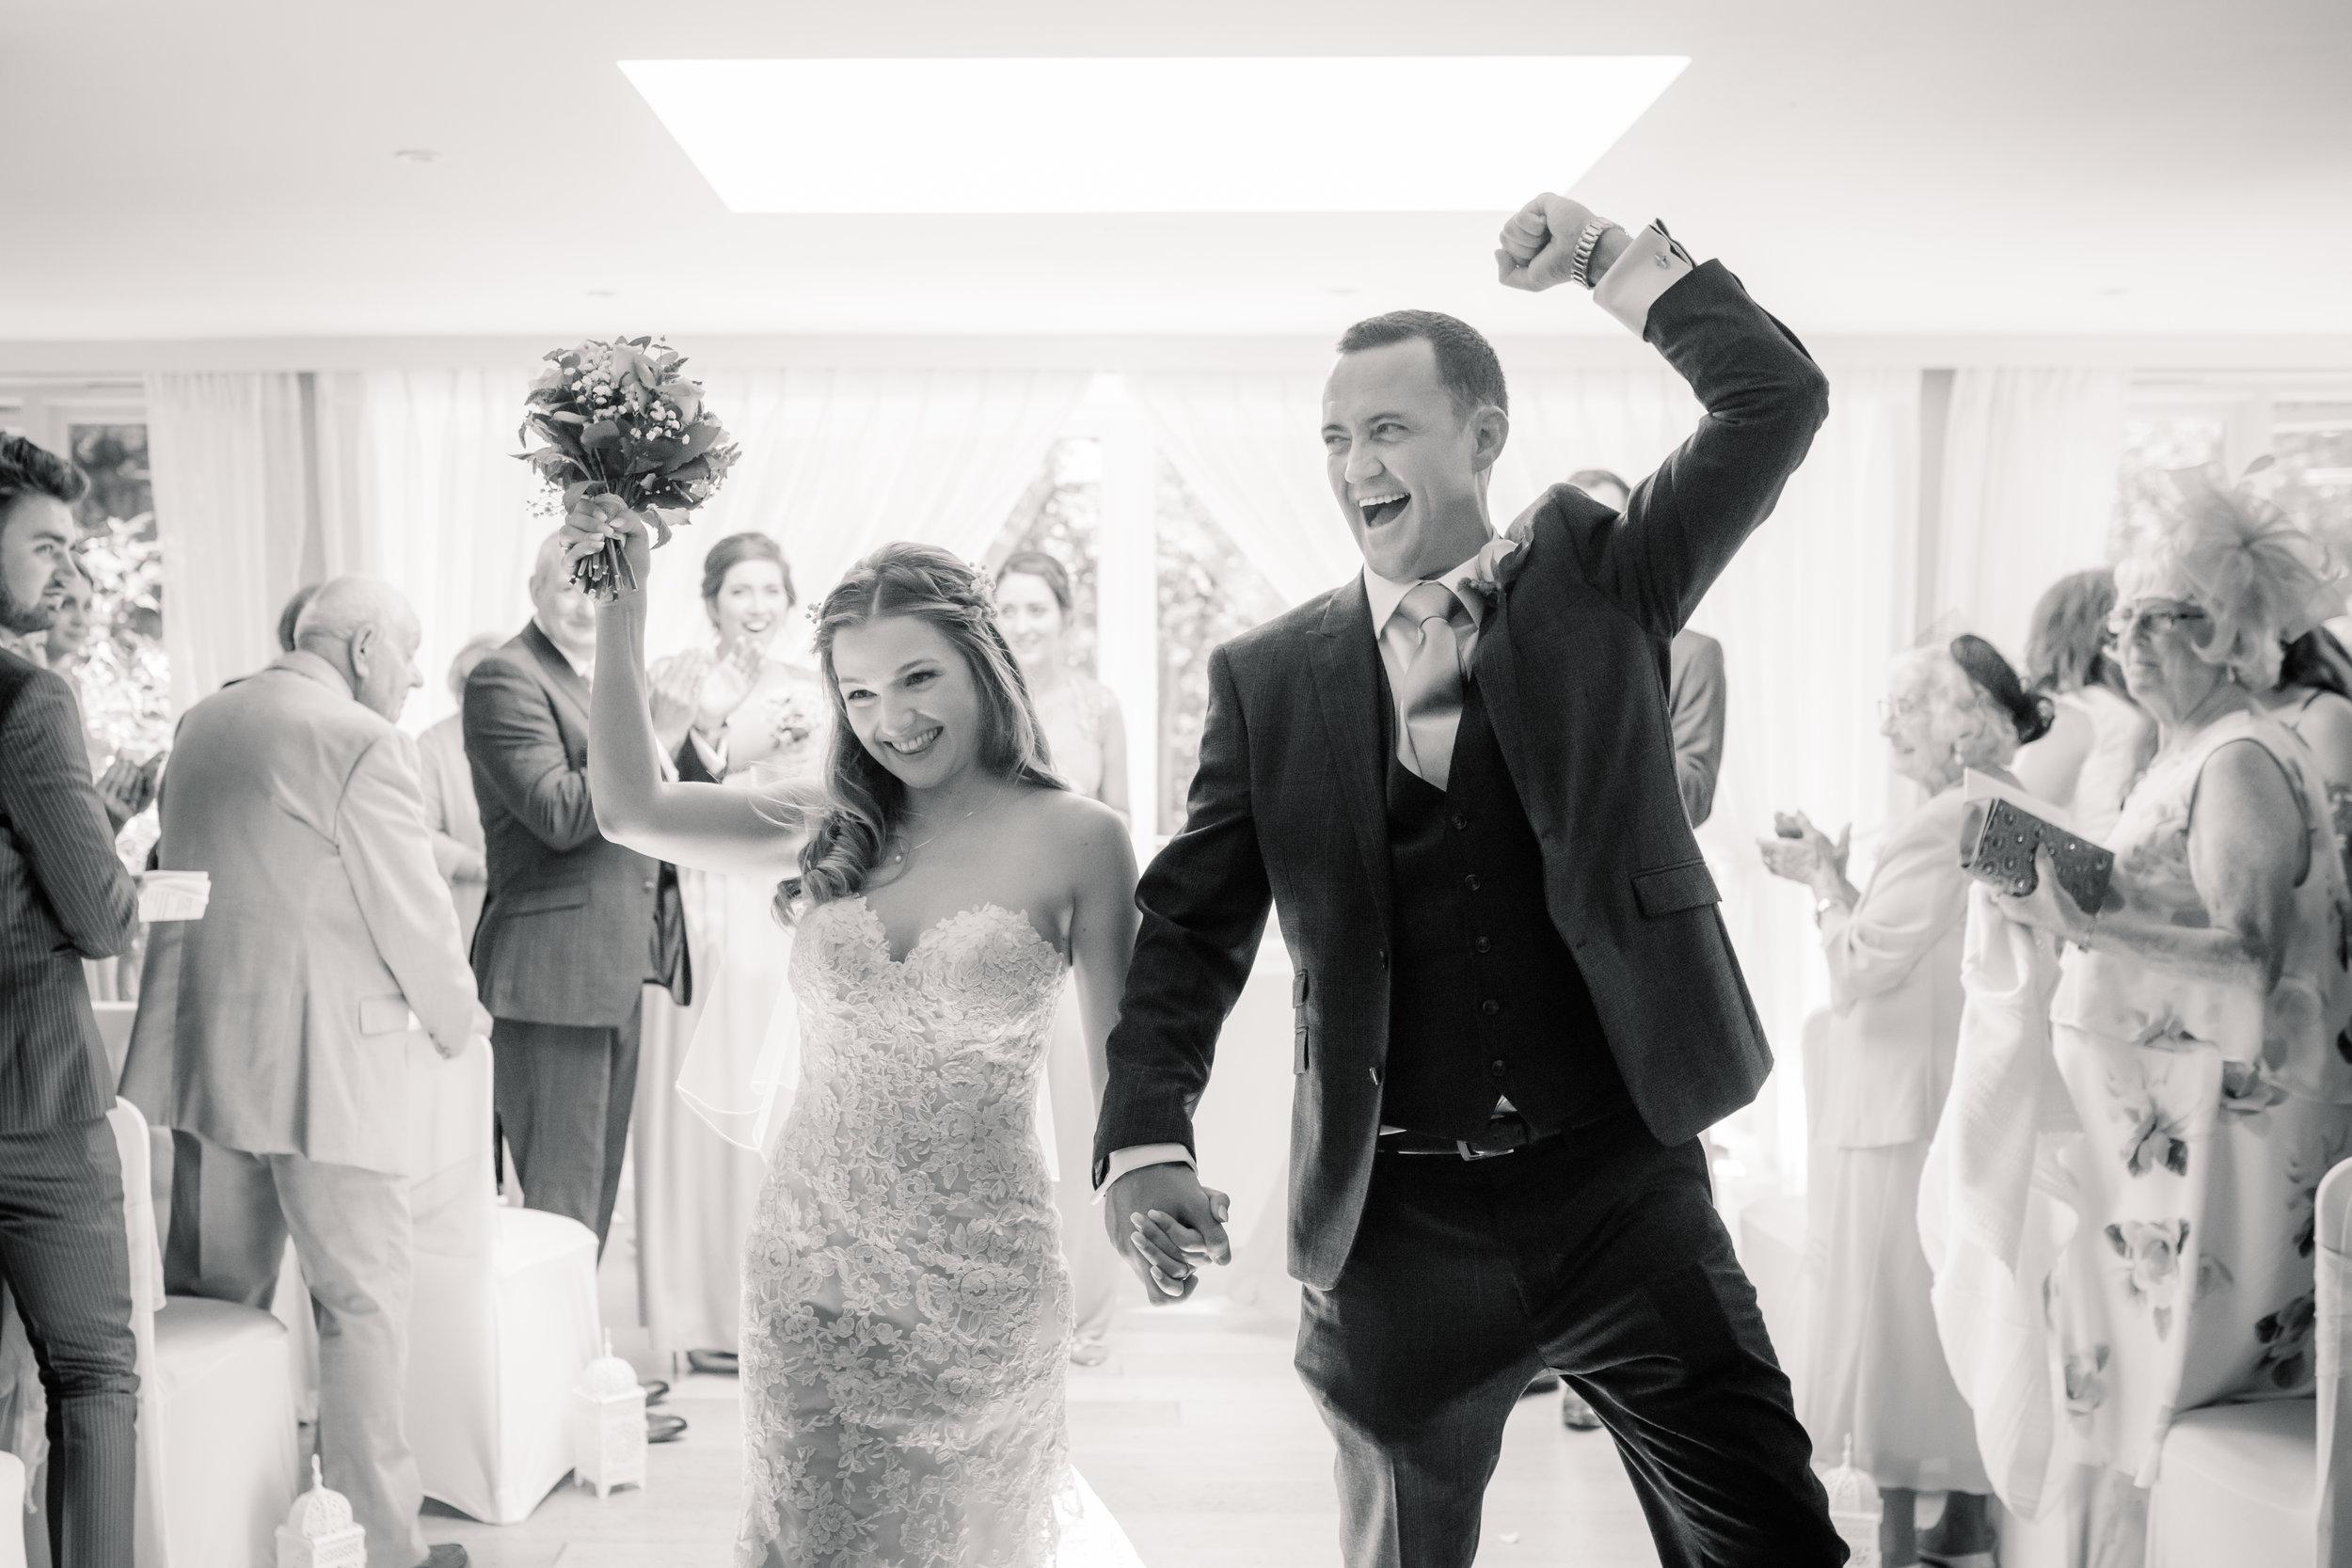 becky-harley-photography-hertfordshire-wedding-photographer-025.JPG